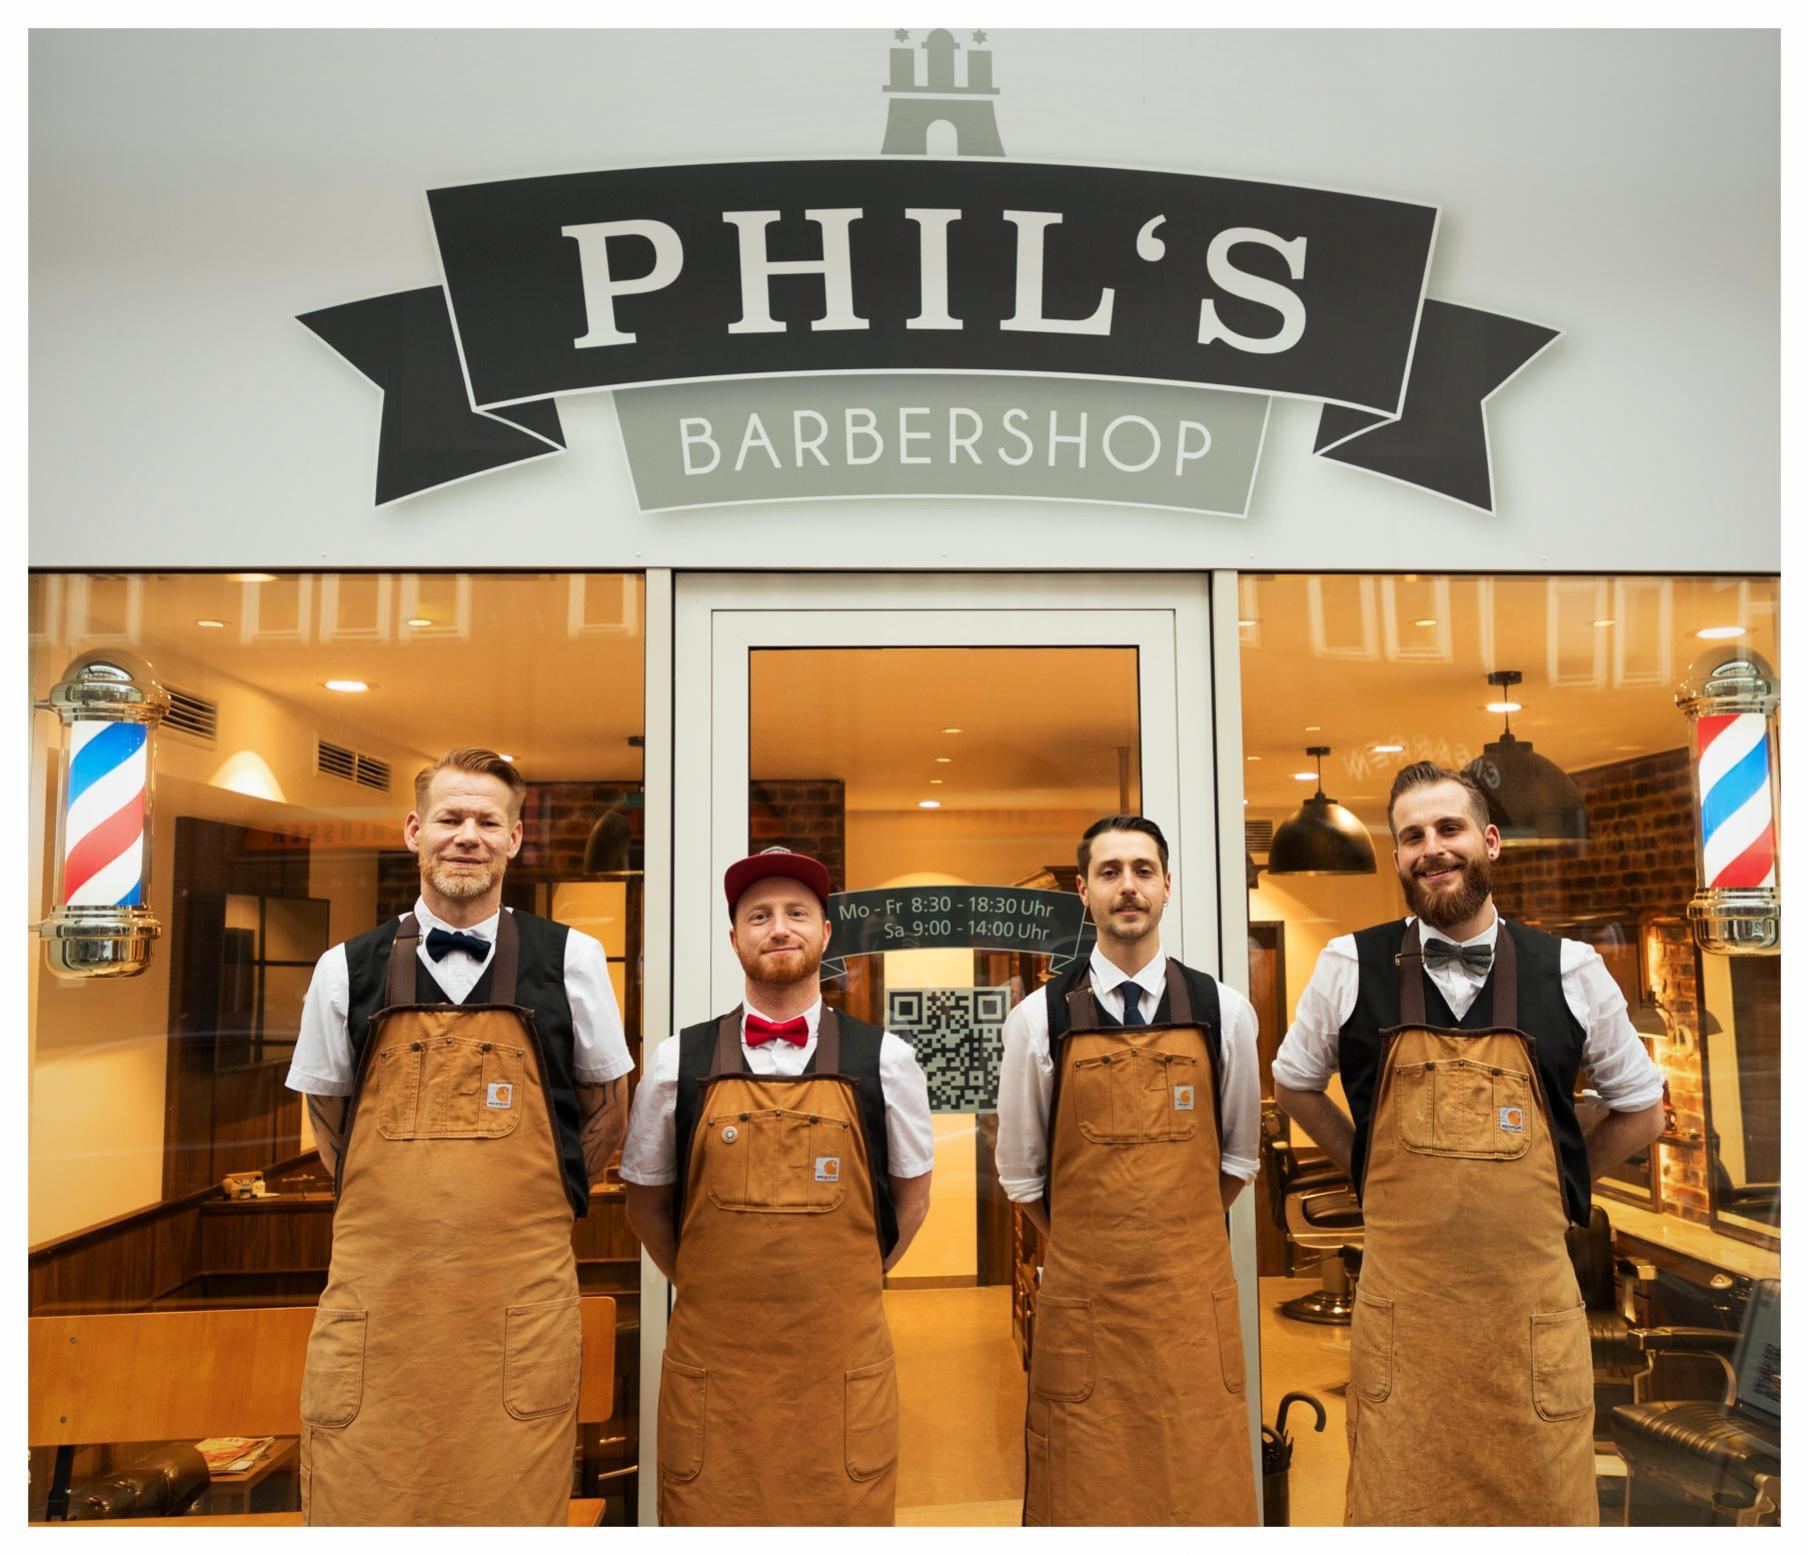 Phils Barbershop  Original Barbershop in Hamburg Der